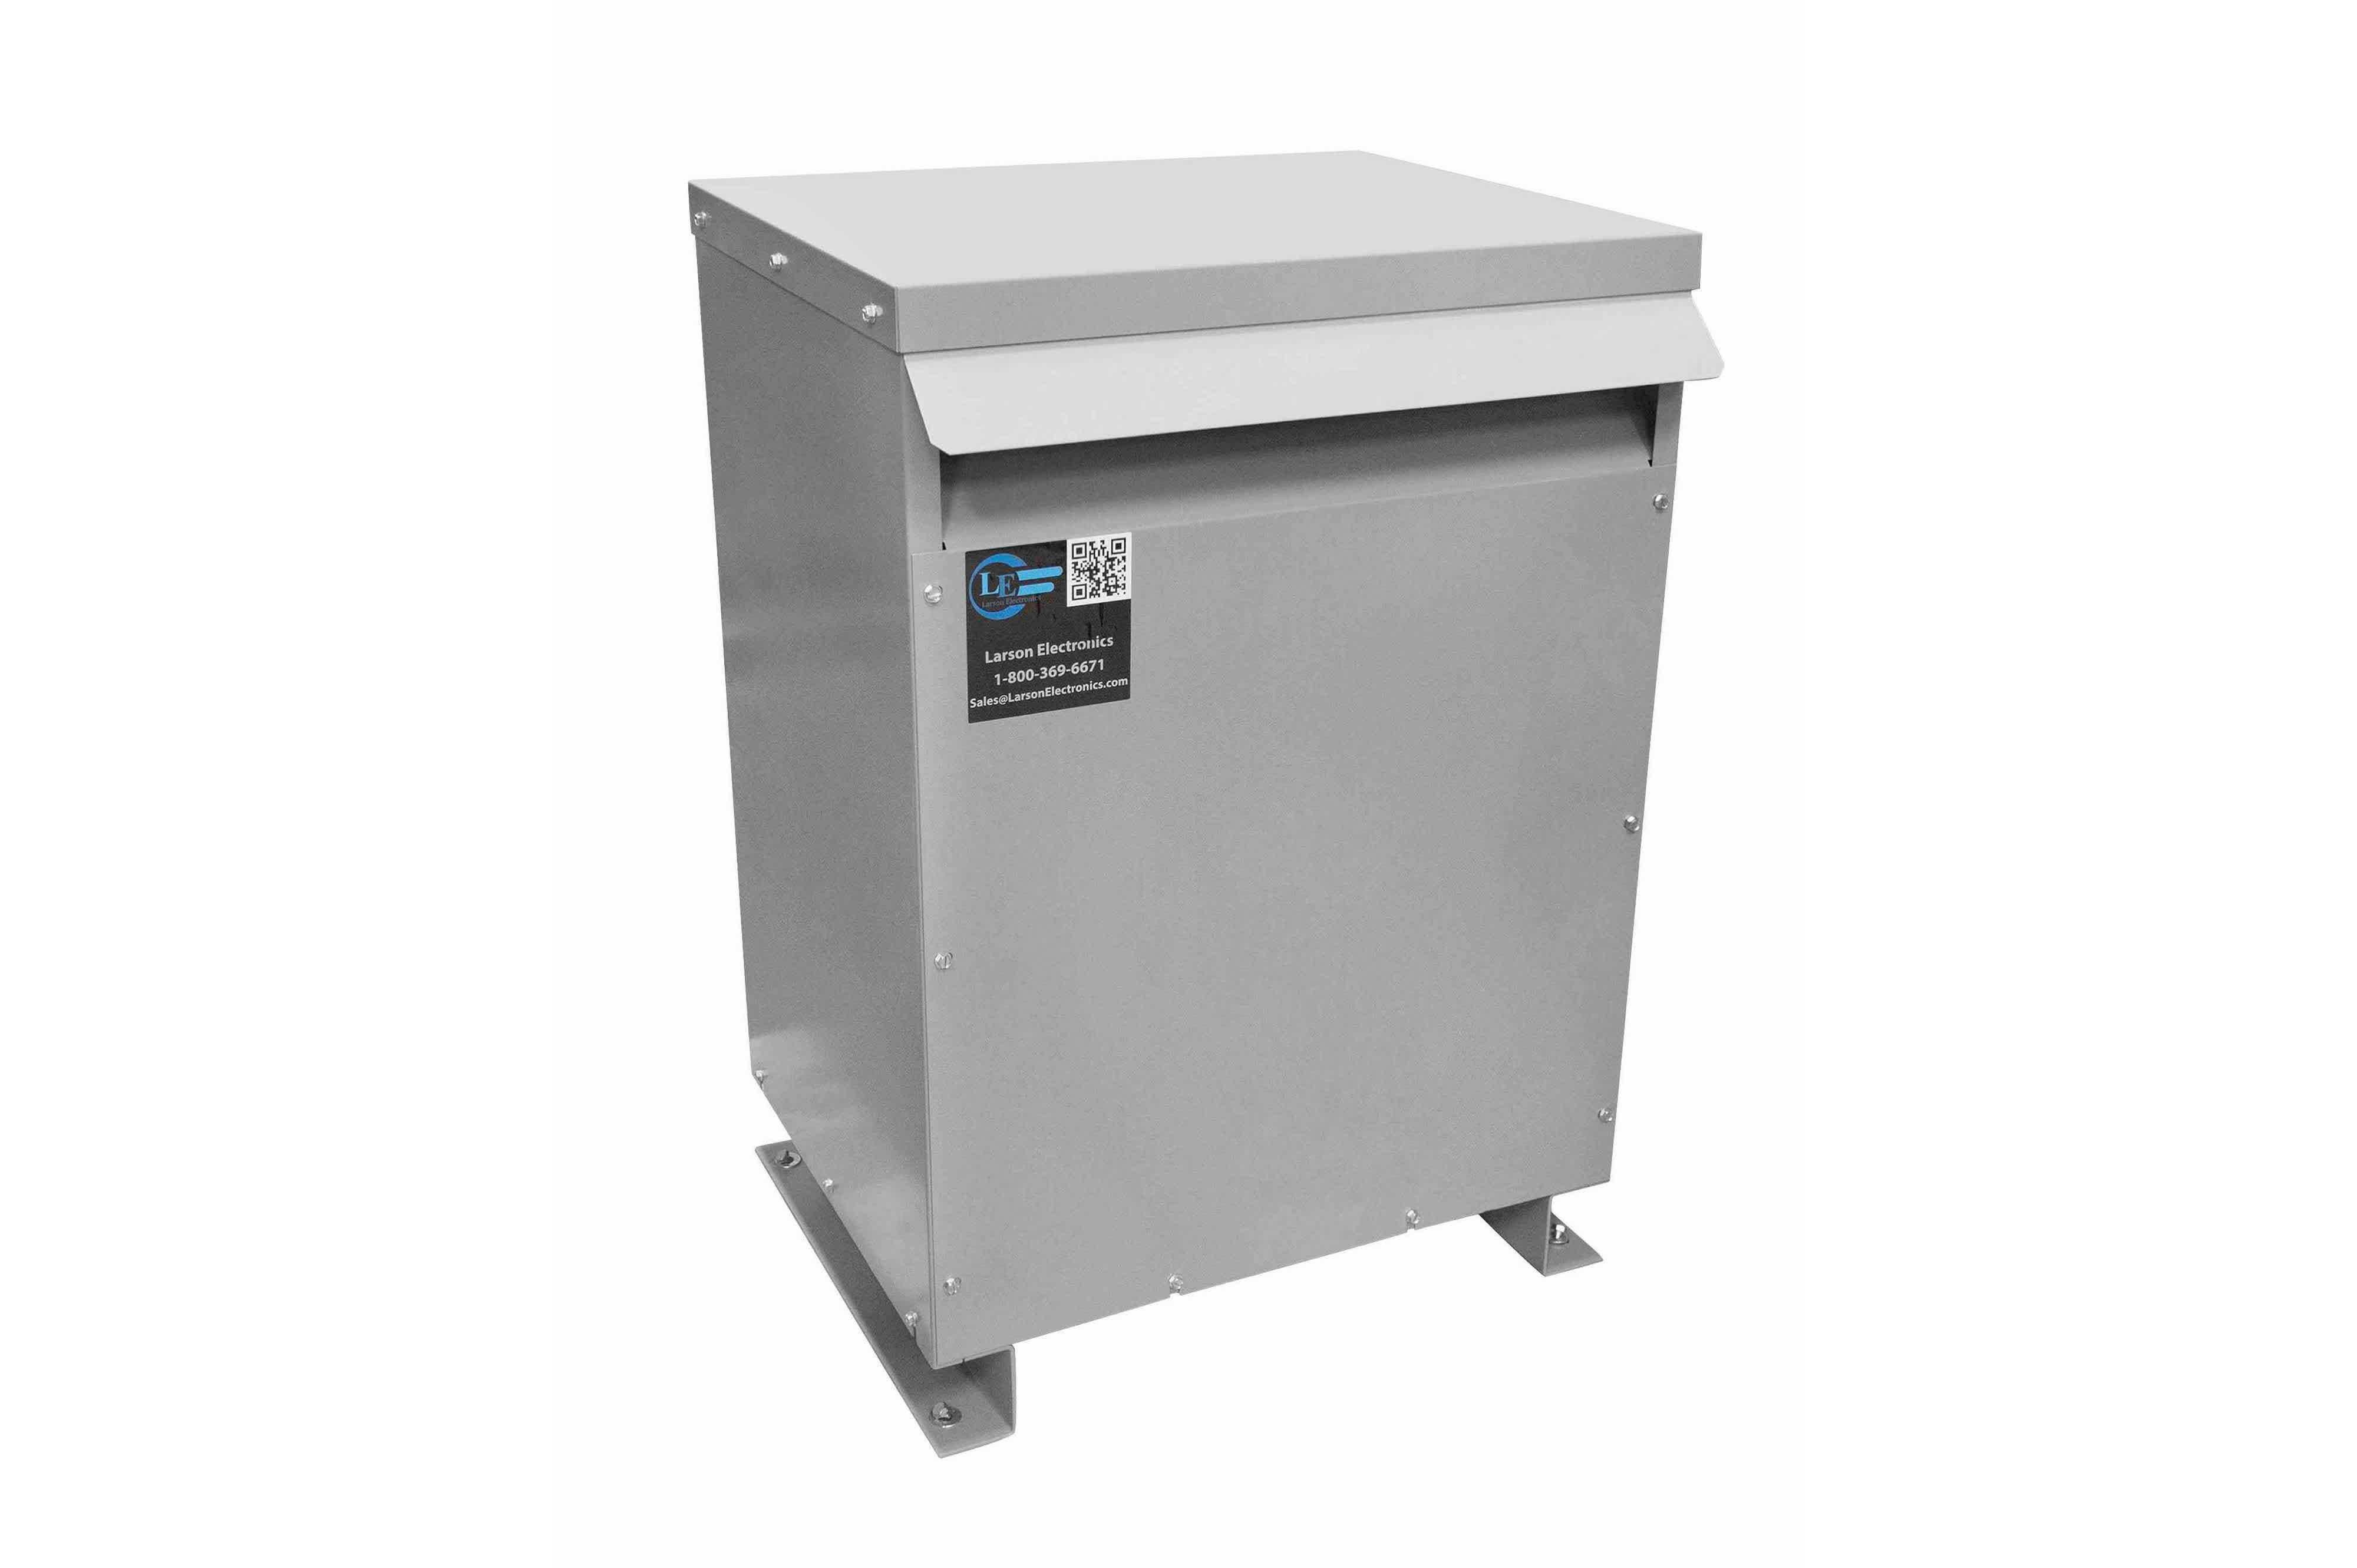 80 kVA 3PH Isolation Transformer, 400V Wye Primary, 240V Delta Secondary, N3R, Ventilated, 60 Hz